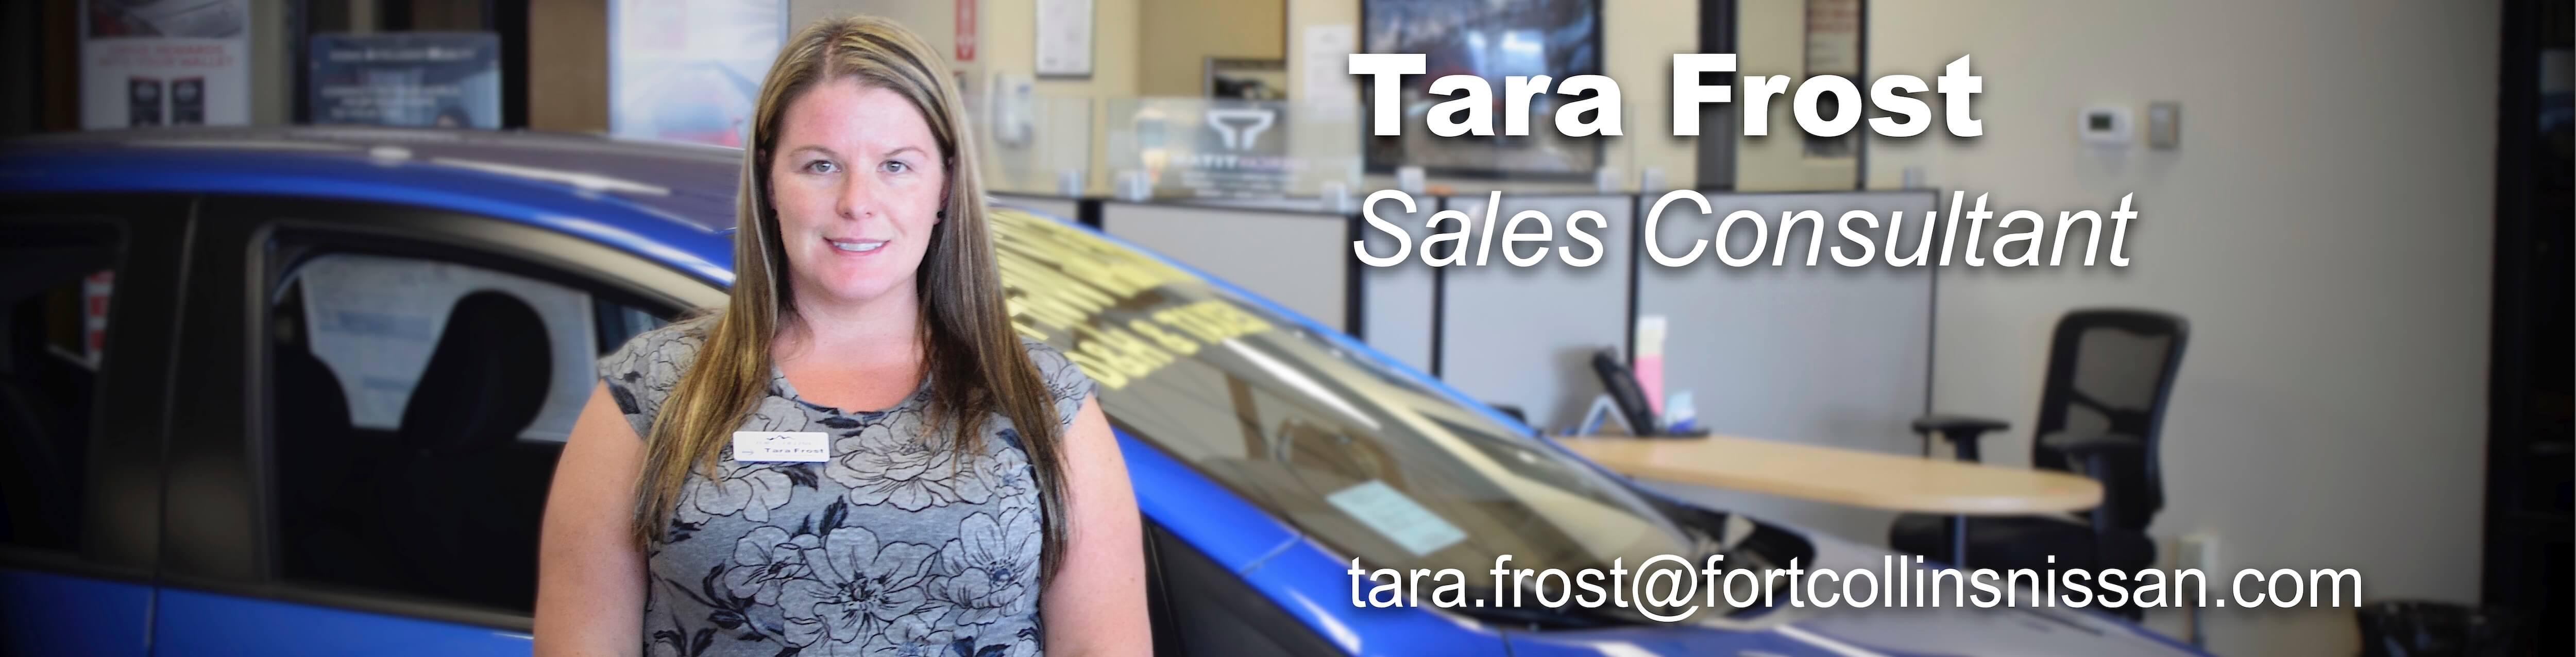 Tara Frost